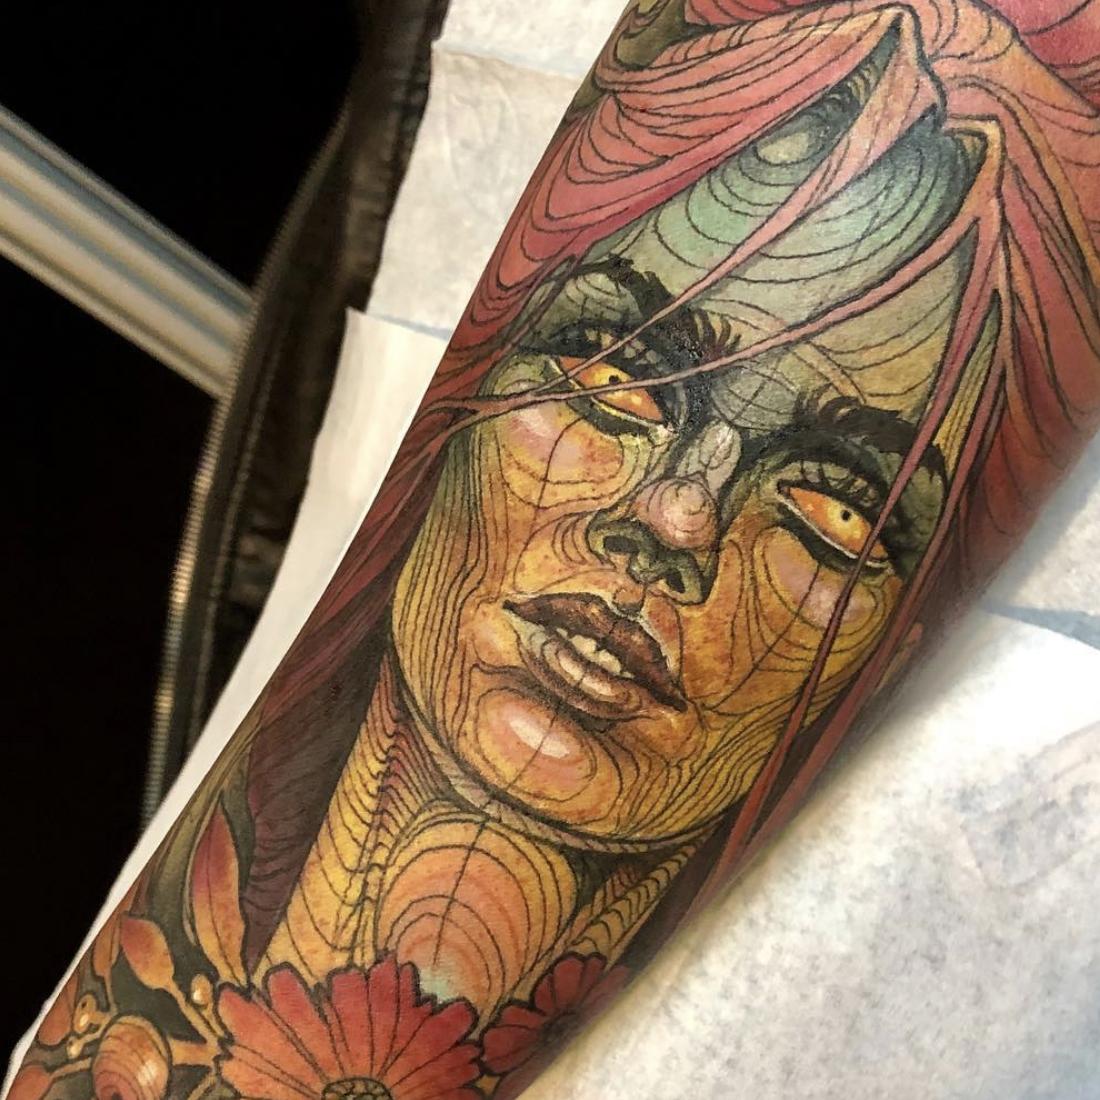 Christina Christie Tattoo Feature Artist